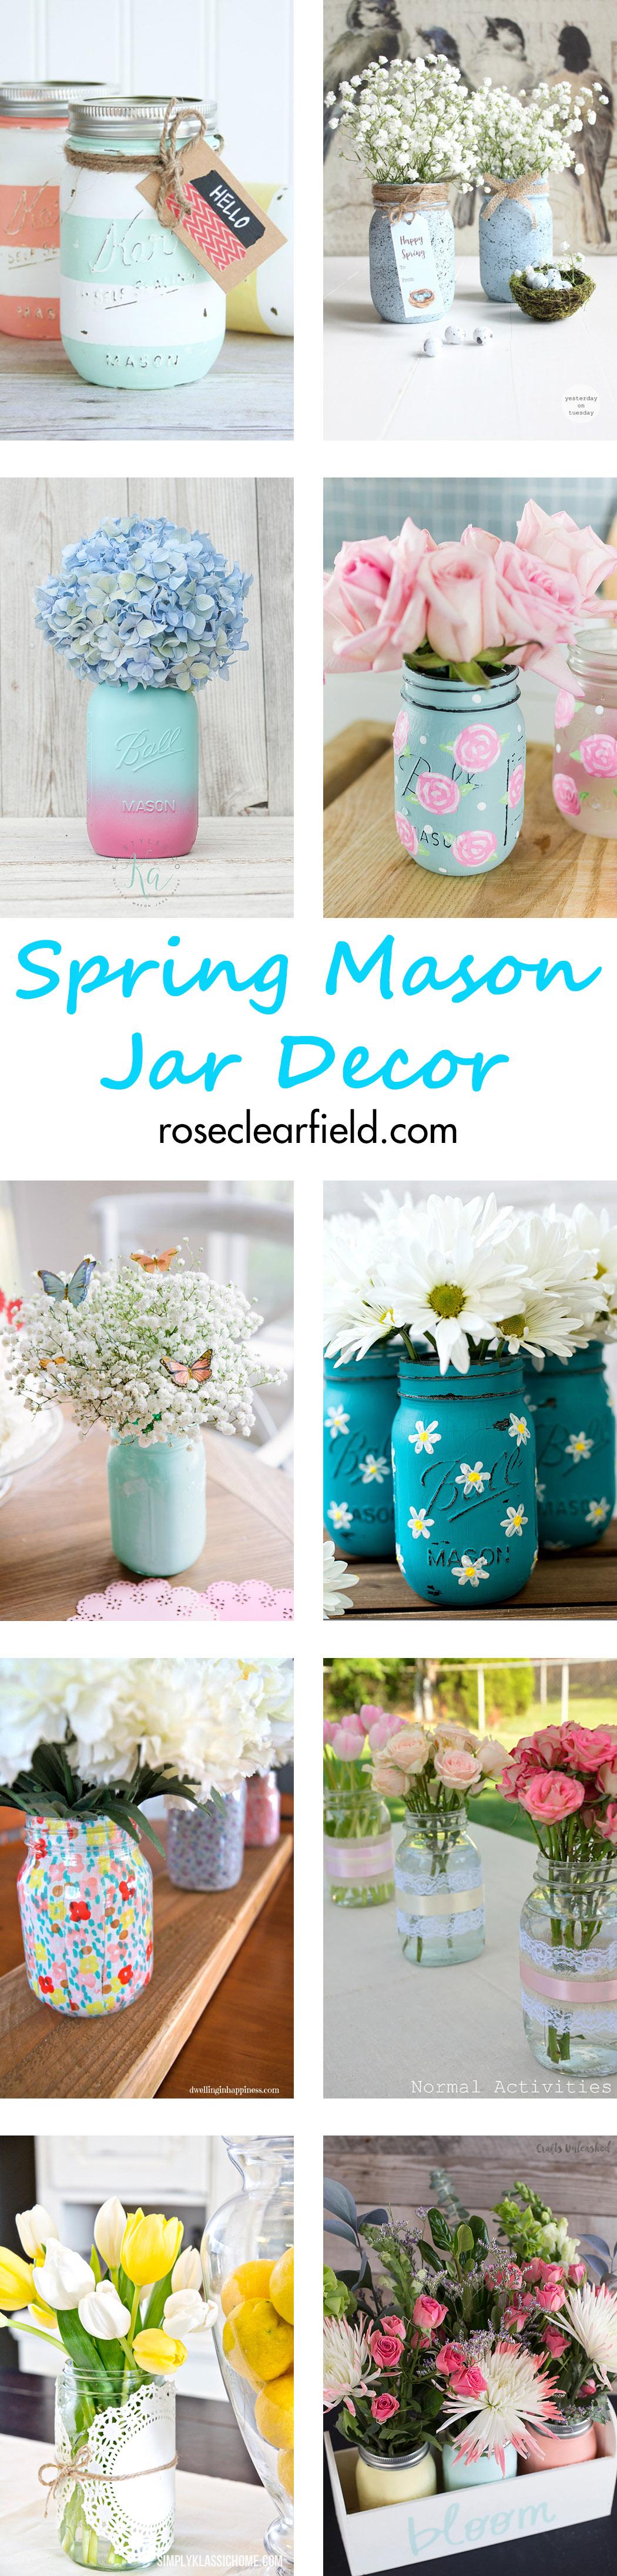 Spring Mason Jar Decor | http://www.roseclearfield.com